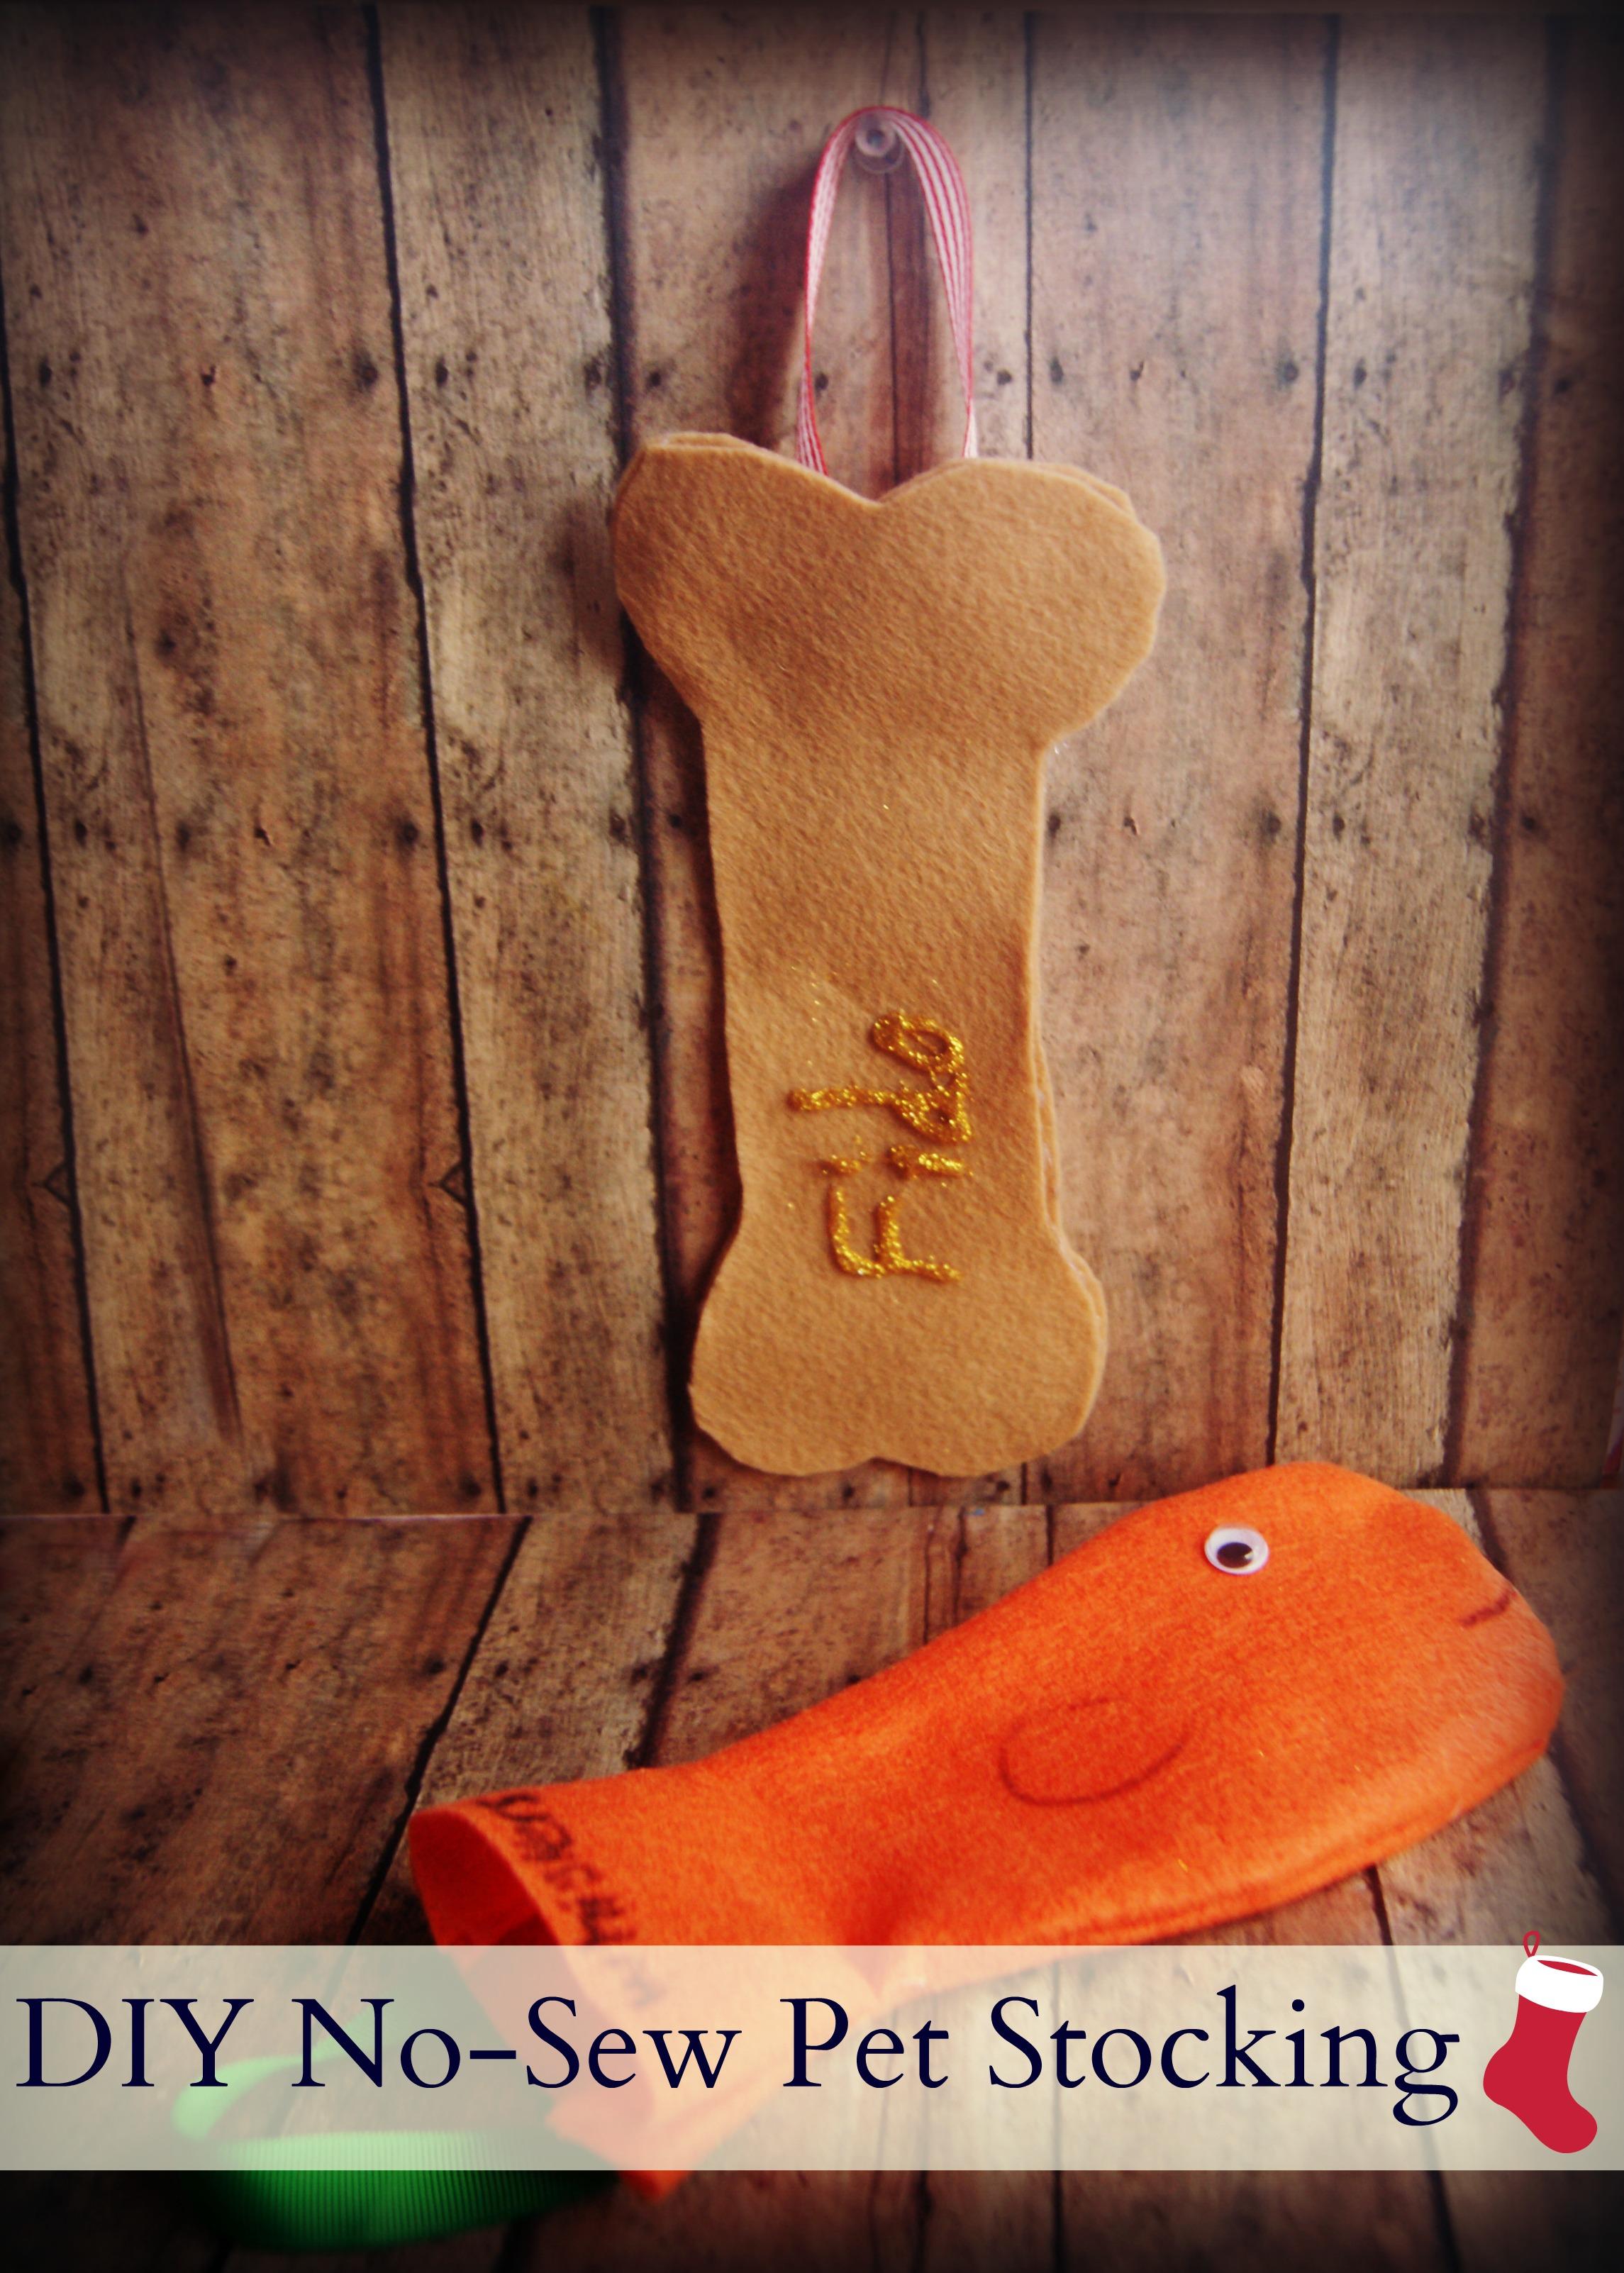 DIY No-Sew Pet Stocking